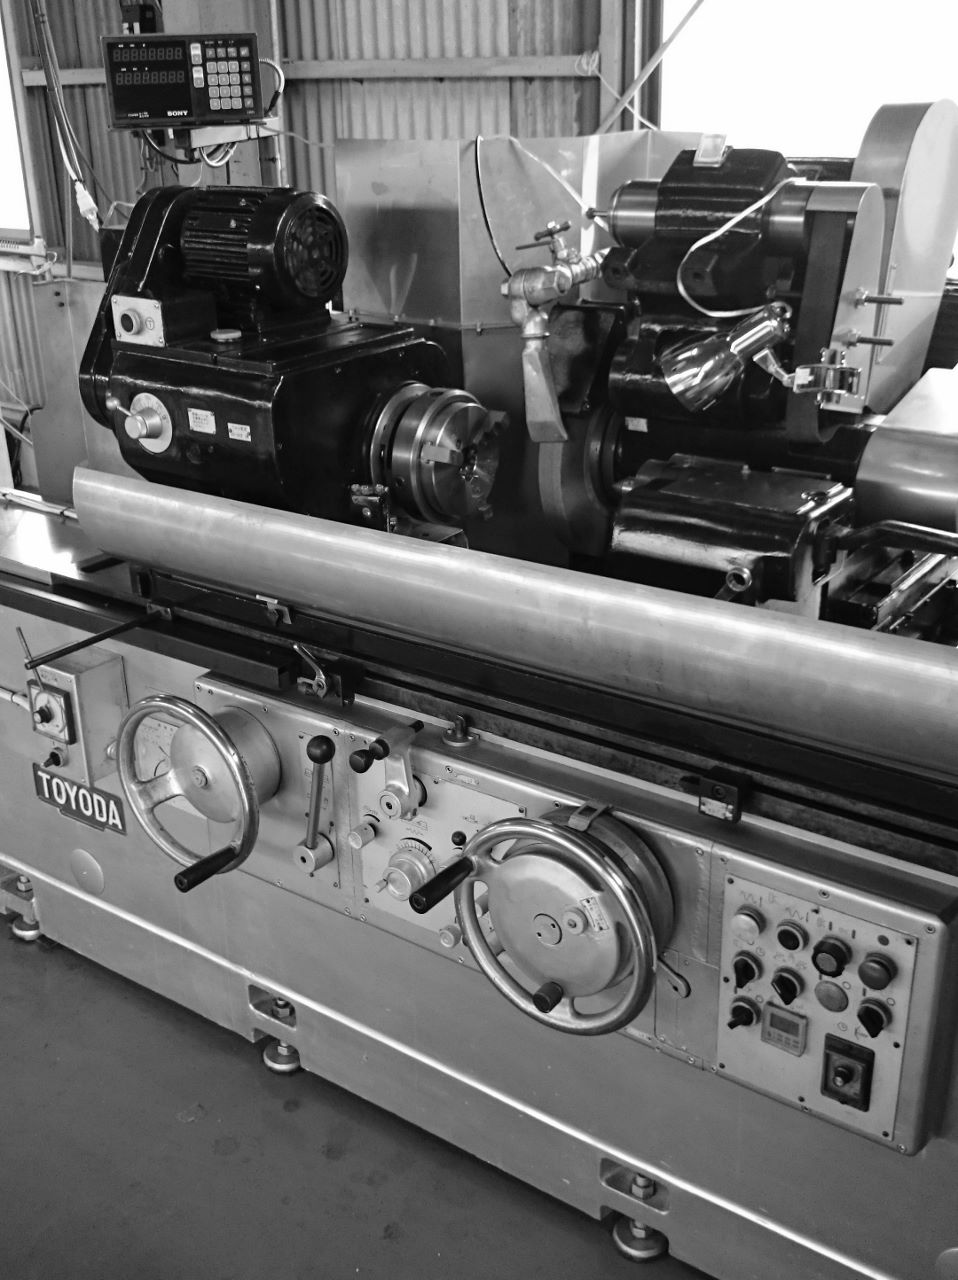 円筒研磨 丸研 円研 浜松東区 治具 設計製作 機械加工 専用機 金属切削 加工組立 フライス 旋盤 ワイヤーカット